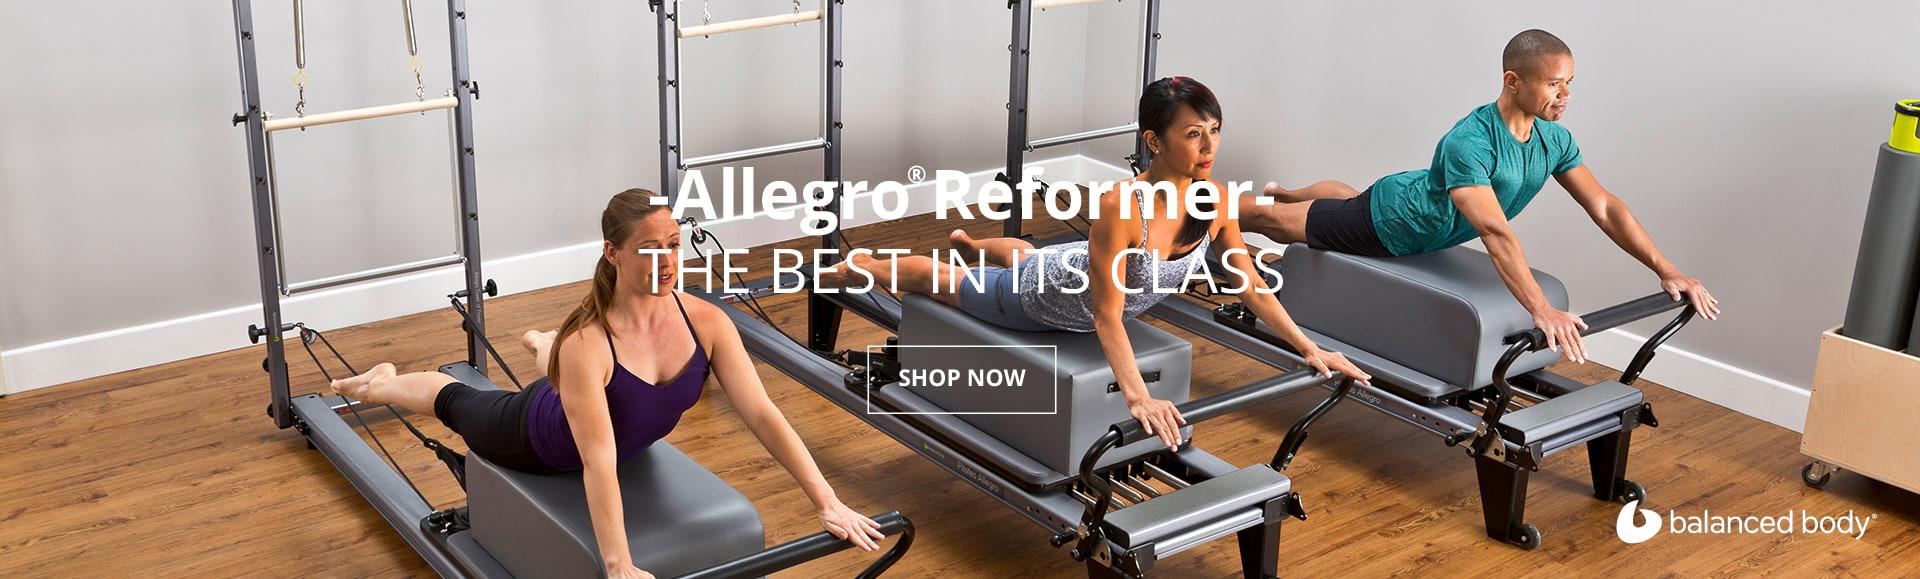 Allegro Reformer - The best in it's class